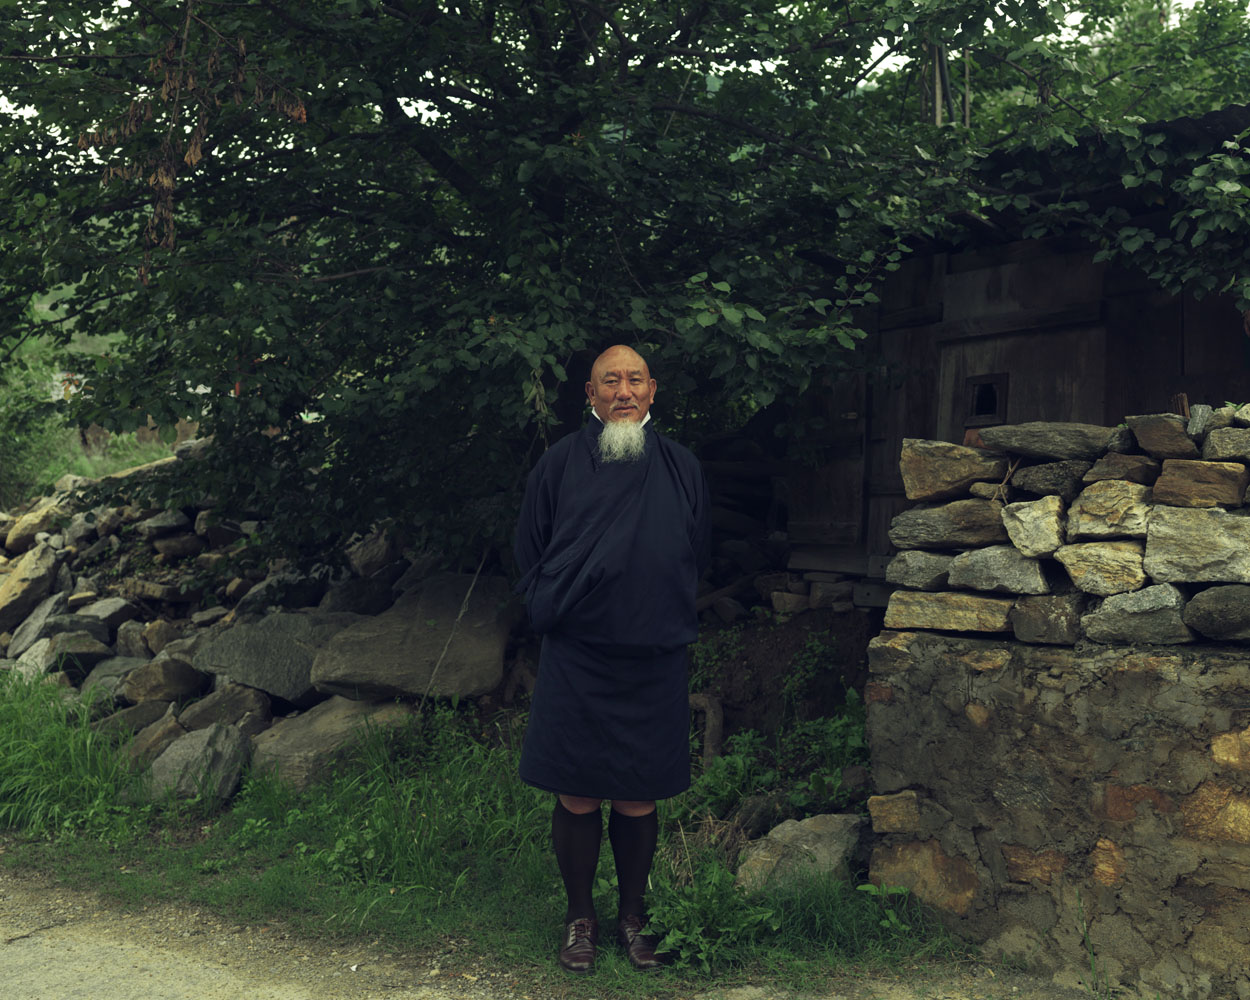 Kado Tshering, bodyguard to Bhutan's previous King, outside his home in Thimphu.